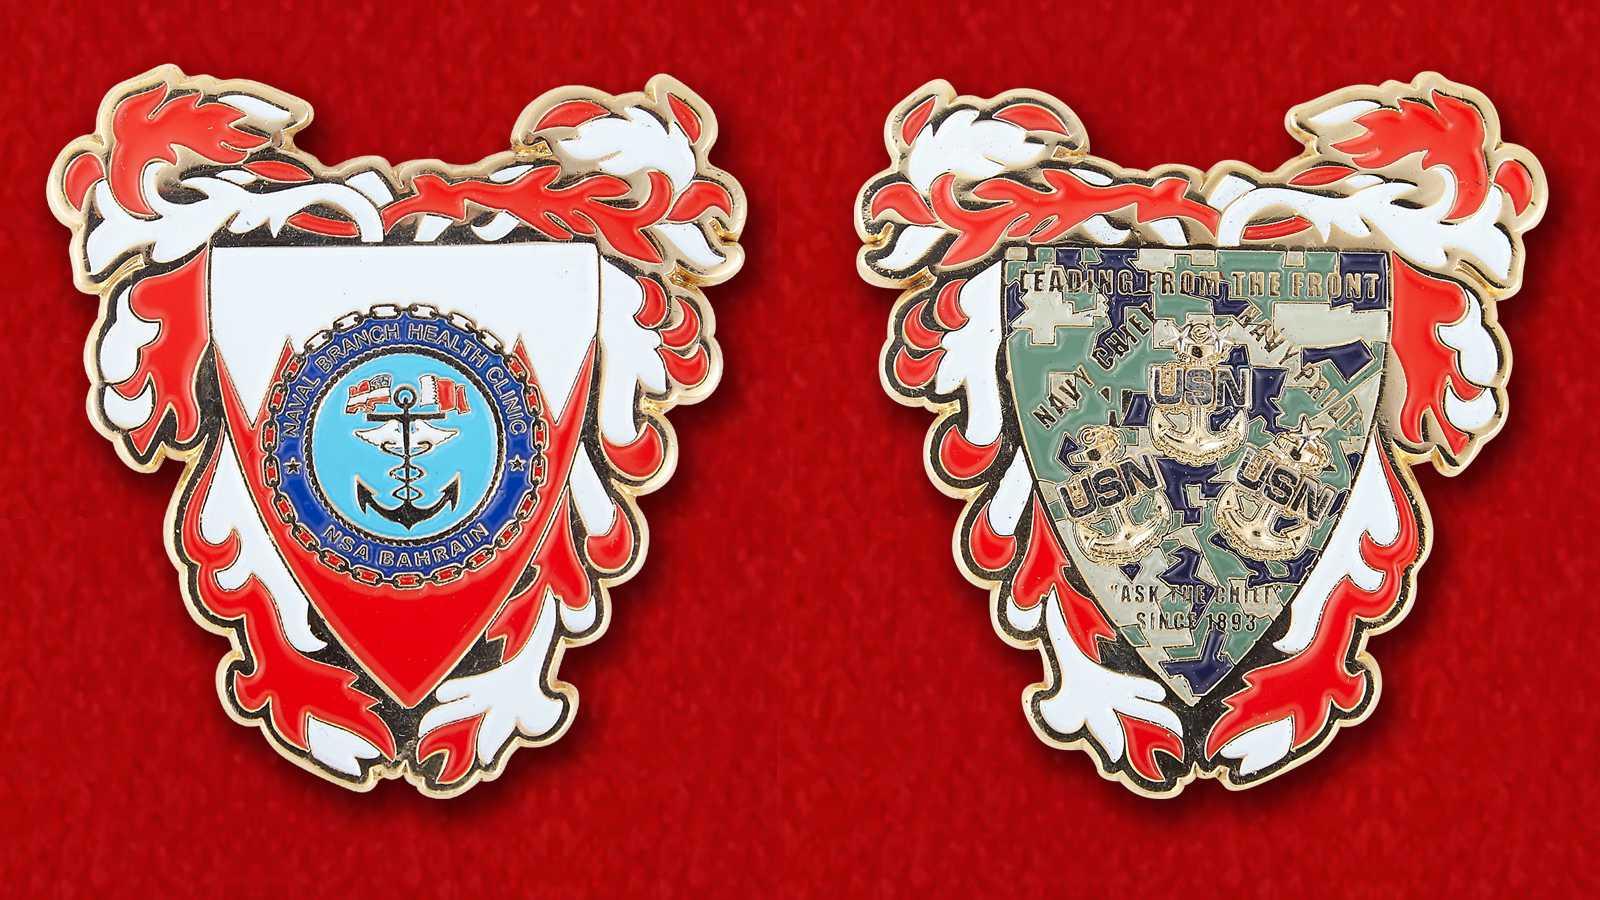 USN Naval Branch Health Clinic NSA Bahrain Challenge Coin